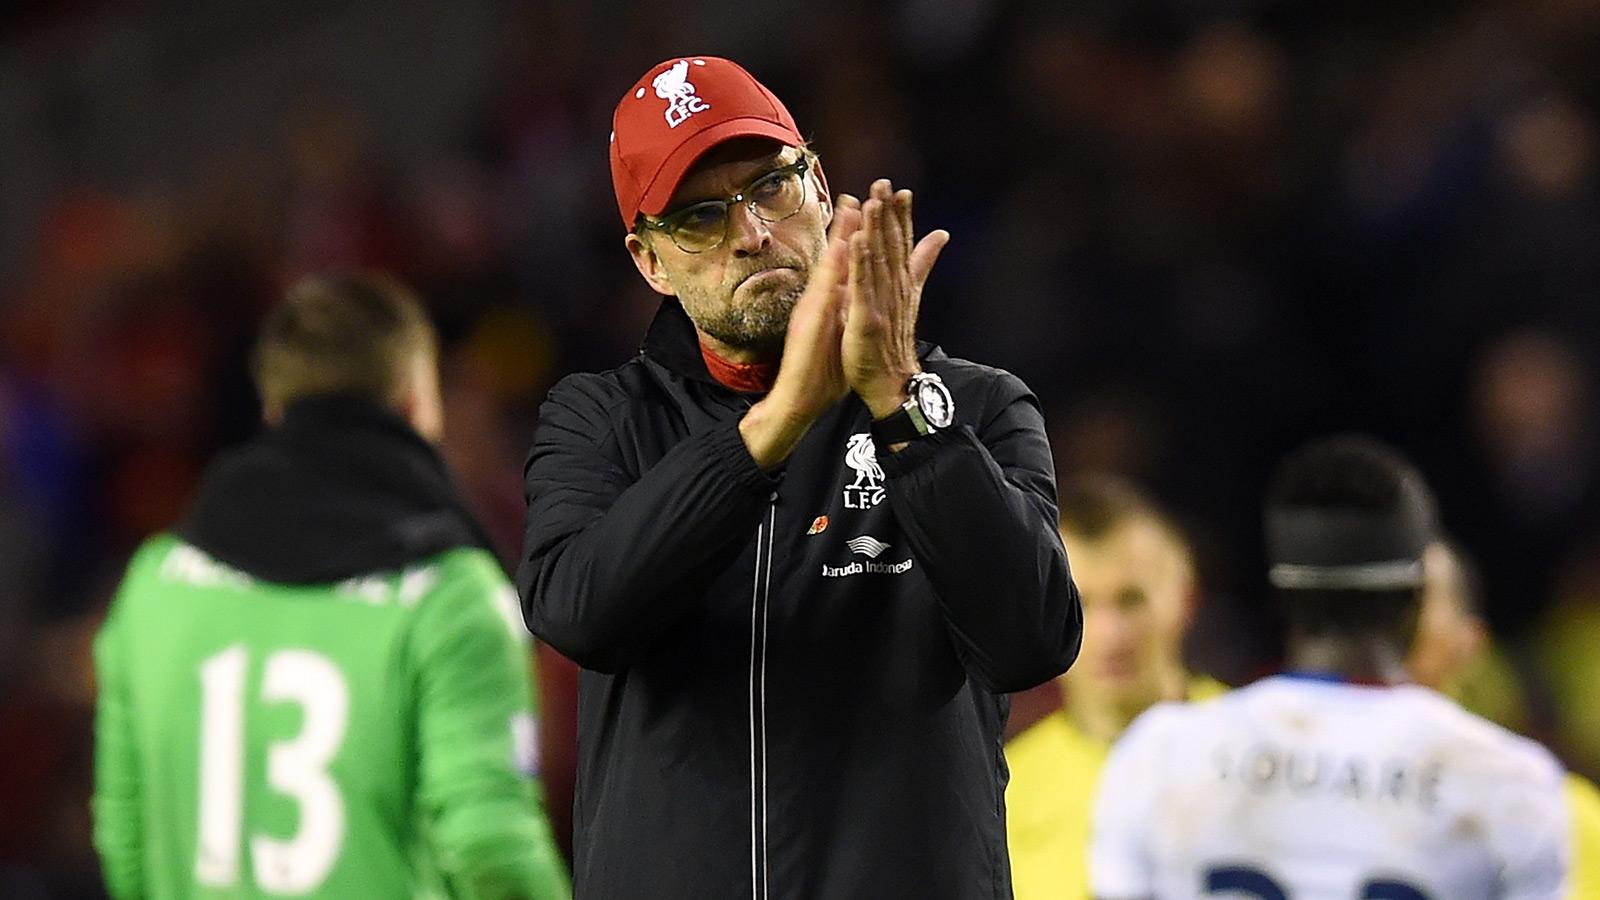 Reds boss Klopp admits he 'felt alone' as fans left Anfield early